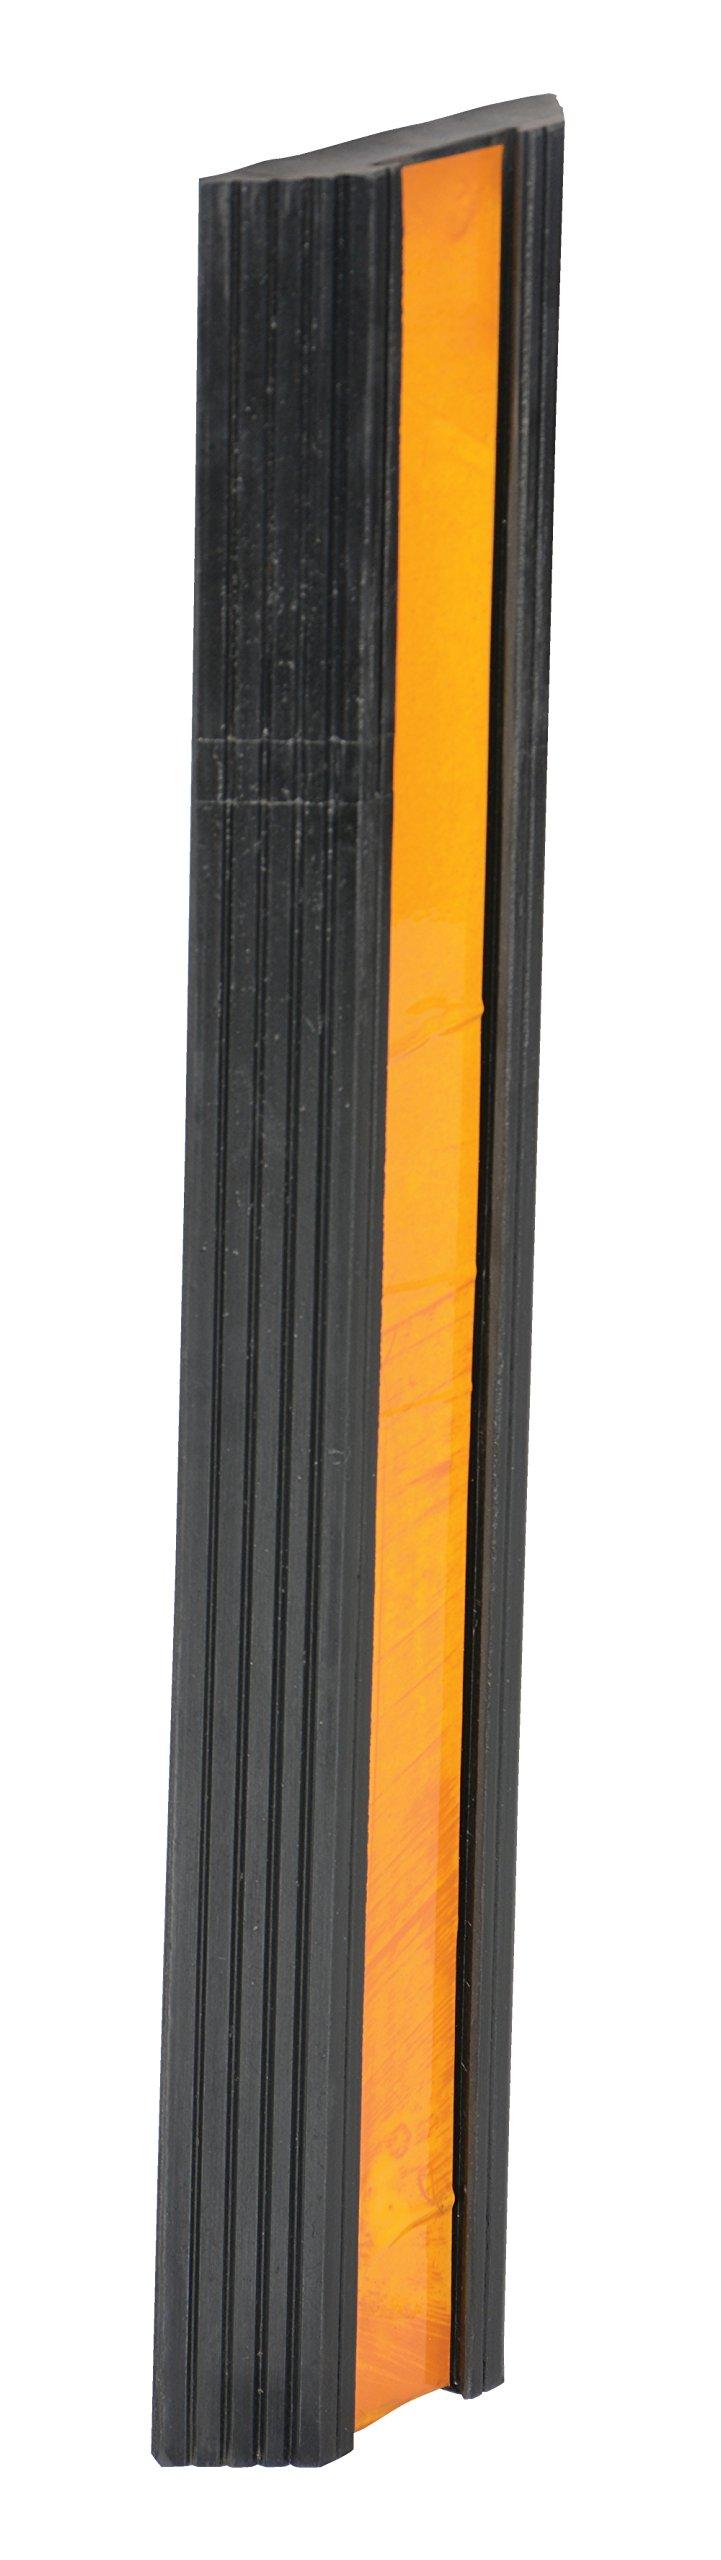 Vestil BS-24 Rubber Extruded Bumper Stop, Rectangular, 24'' Length, 5-1/2'' Width, 1-1/4'' Depth